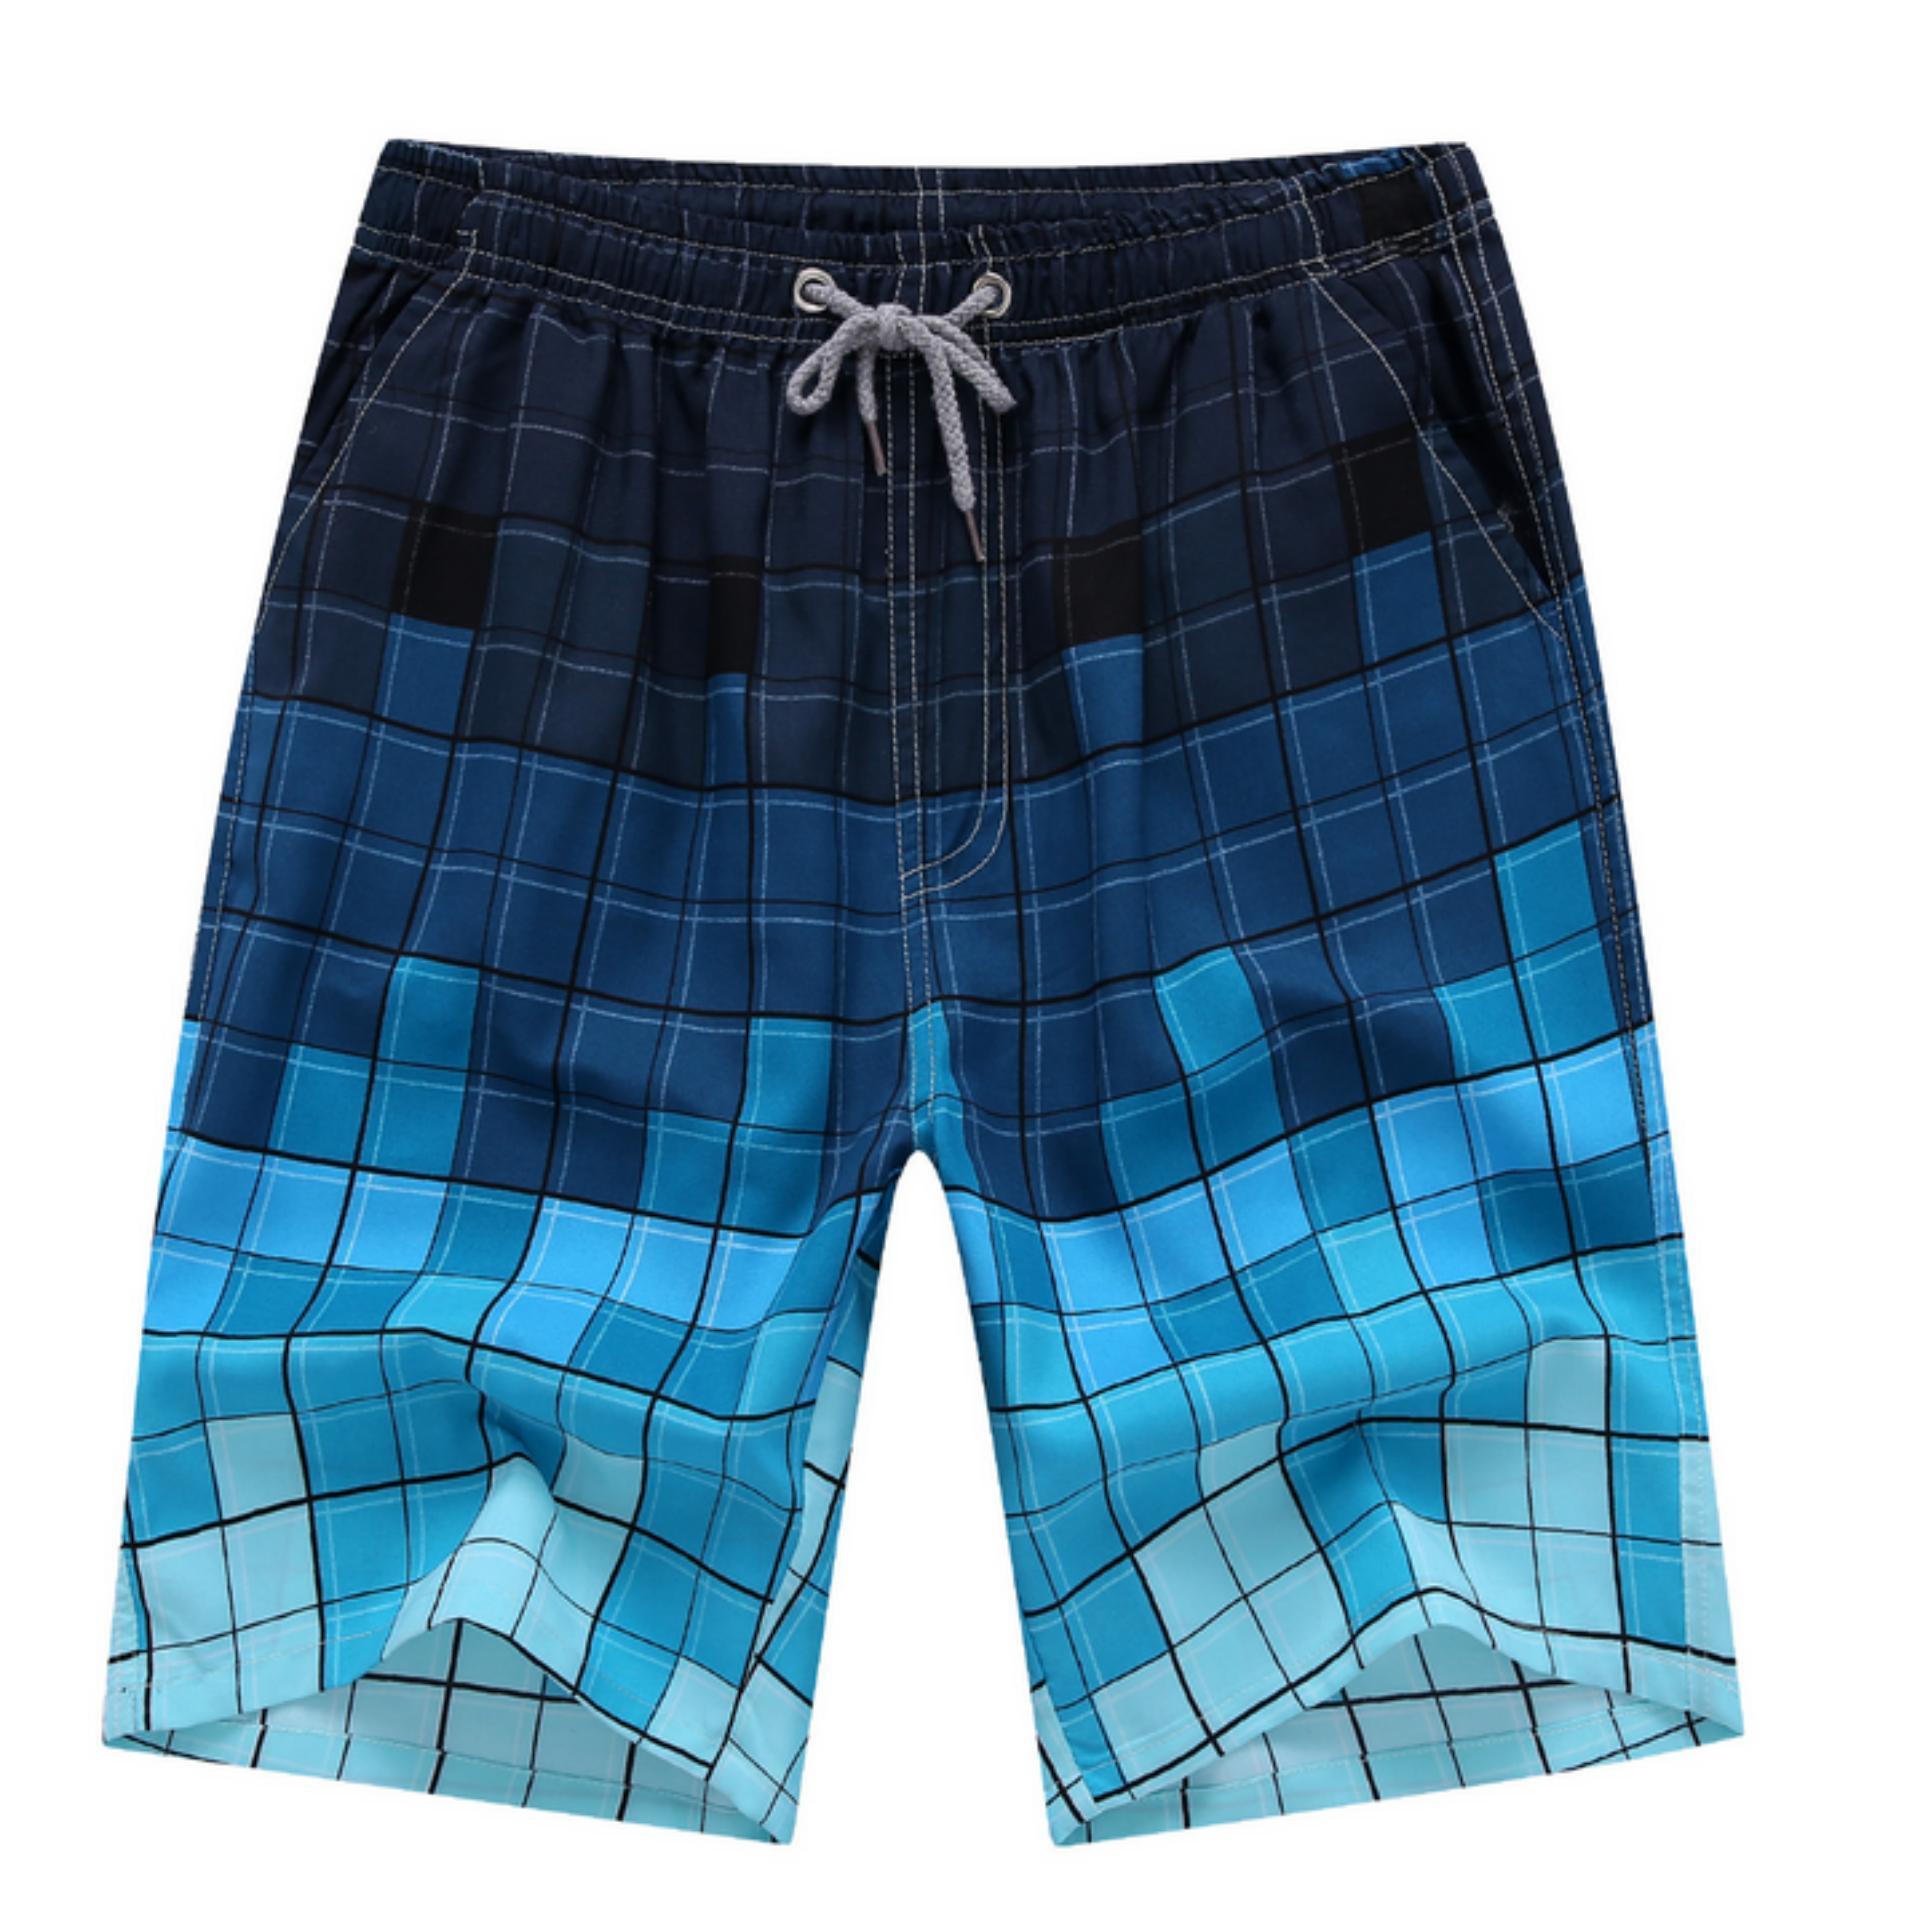 ... TB santai pria Korea ukuran besar celana pantai biru -International ...